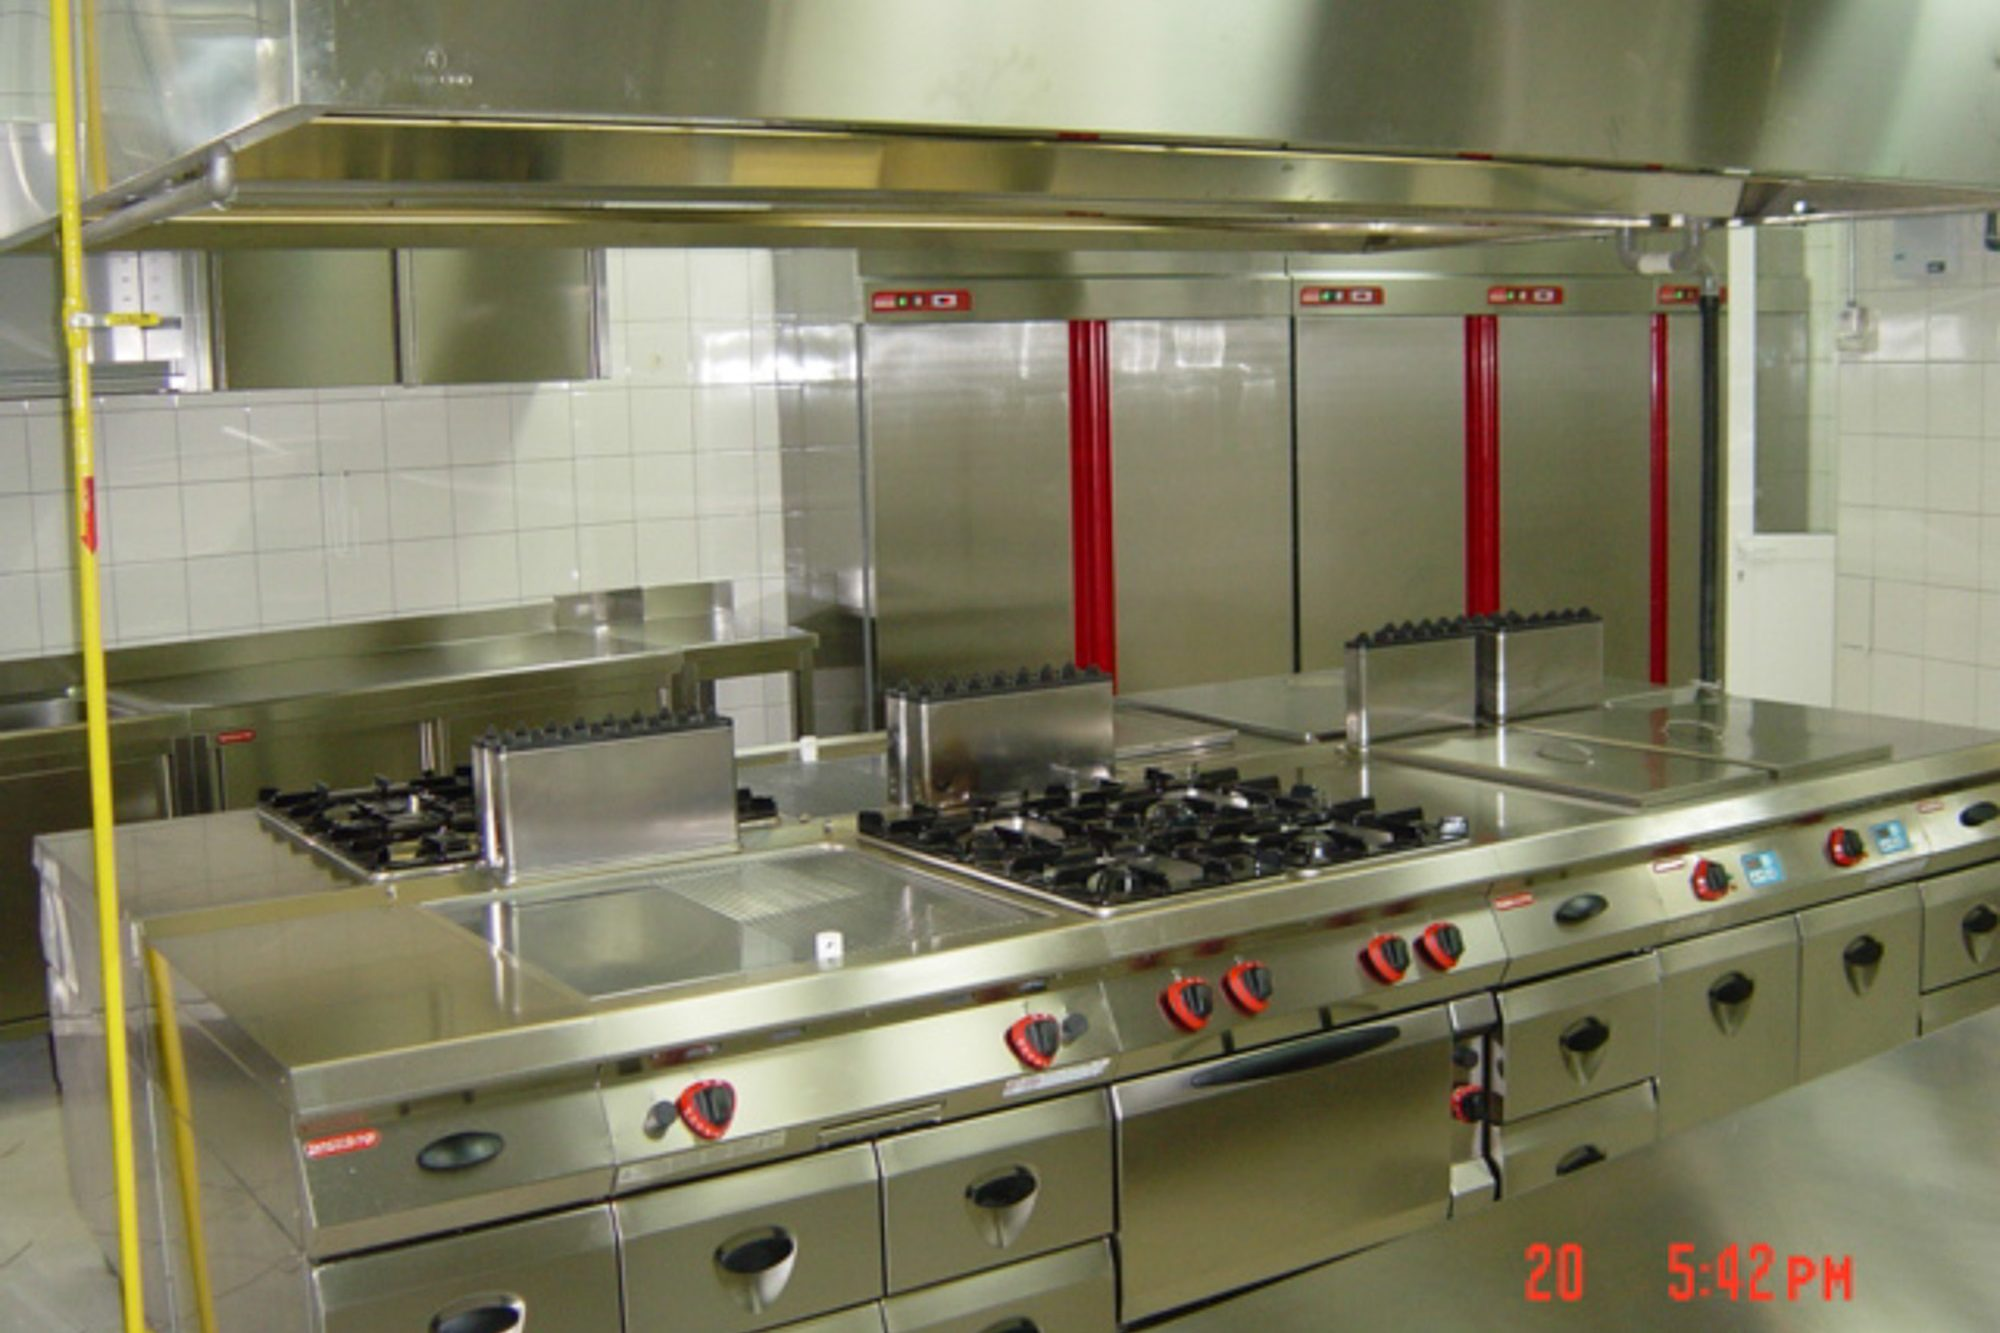 Italia_kitchen_-le_meridien_f-1